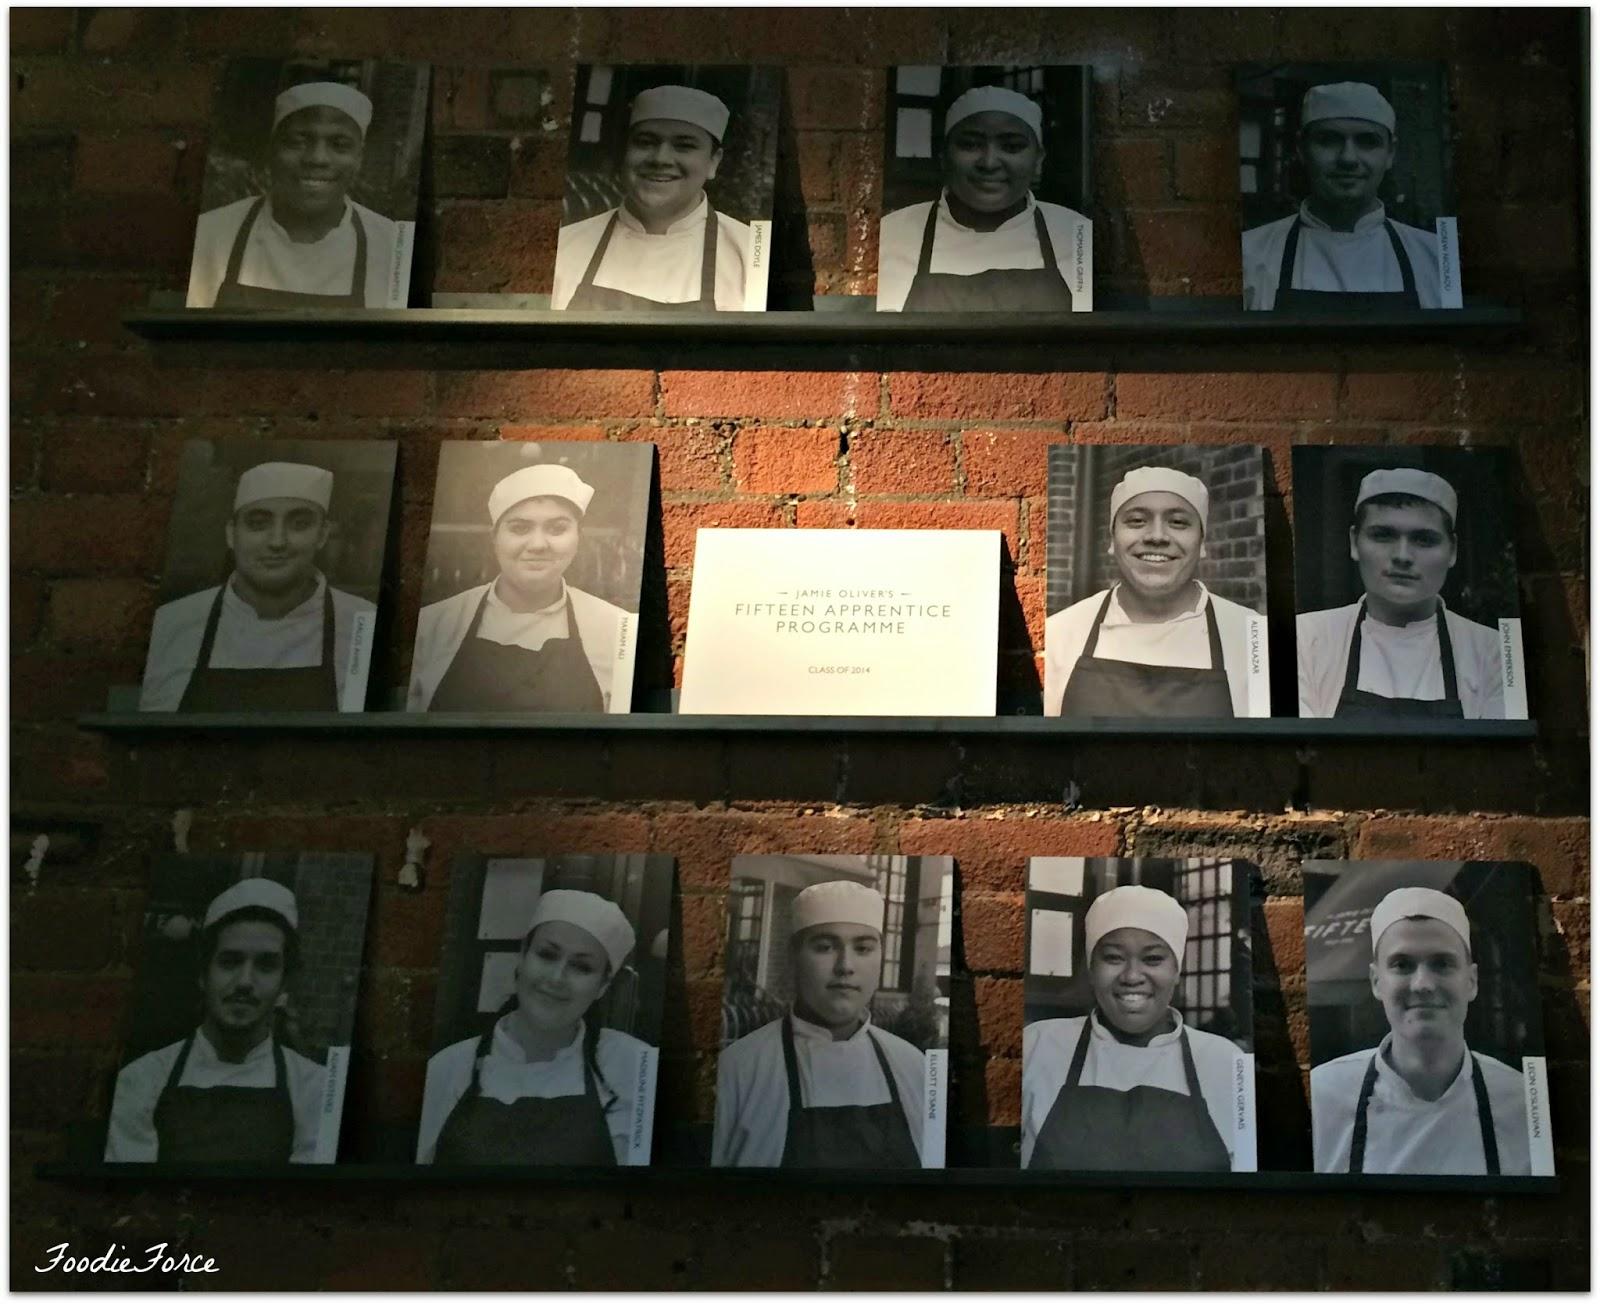 Jamie Oliver Apprentice programme